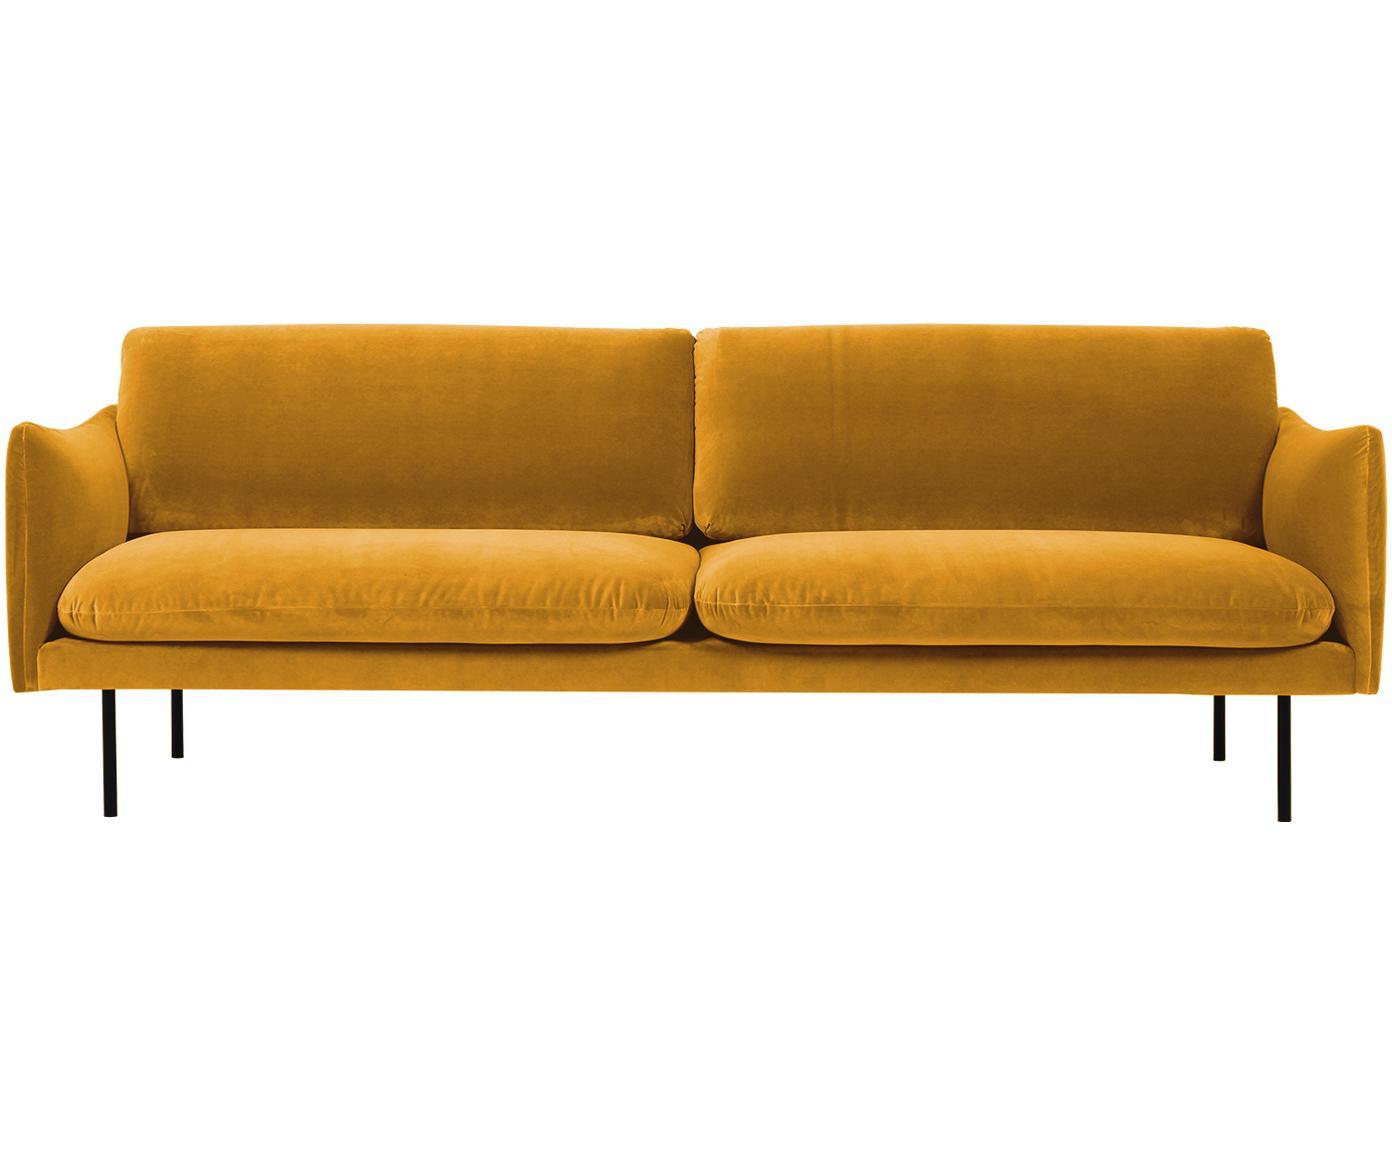 Samt-Sofa Moby (3-Sitzer), Bezug: Samt (Hochwertiger Polyes, Gestell: Massives Kiefernholz, Samt Senfgelb, B 220 x T 95 cm